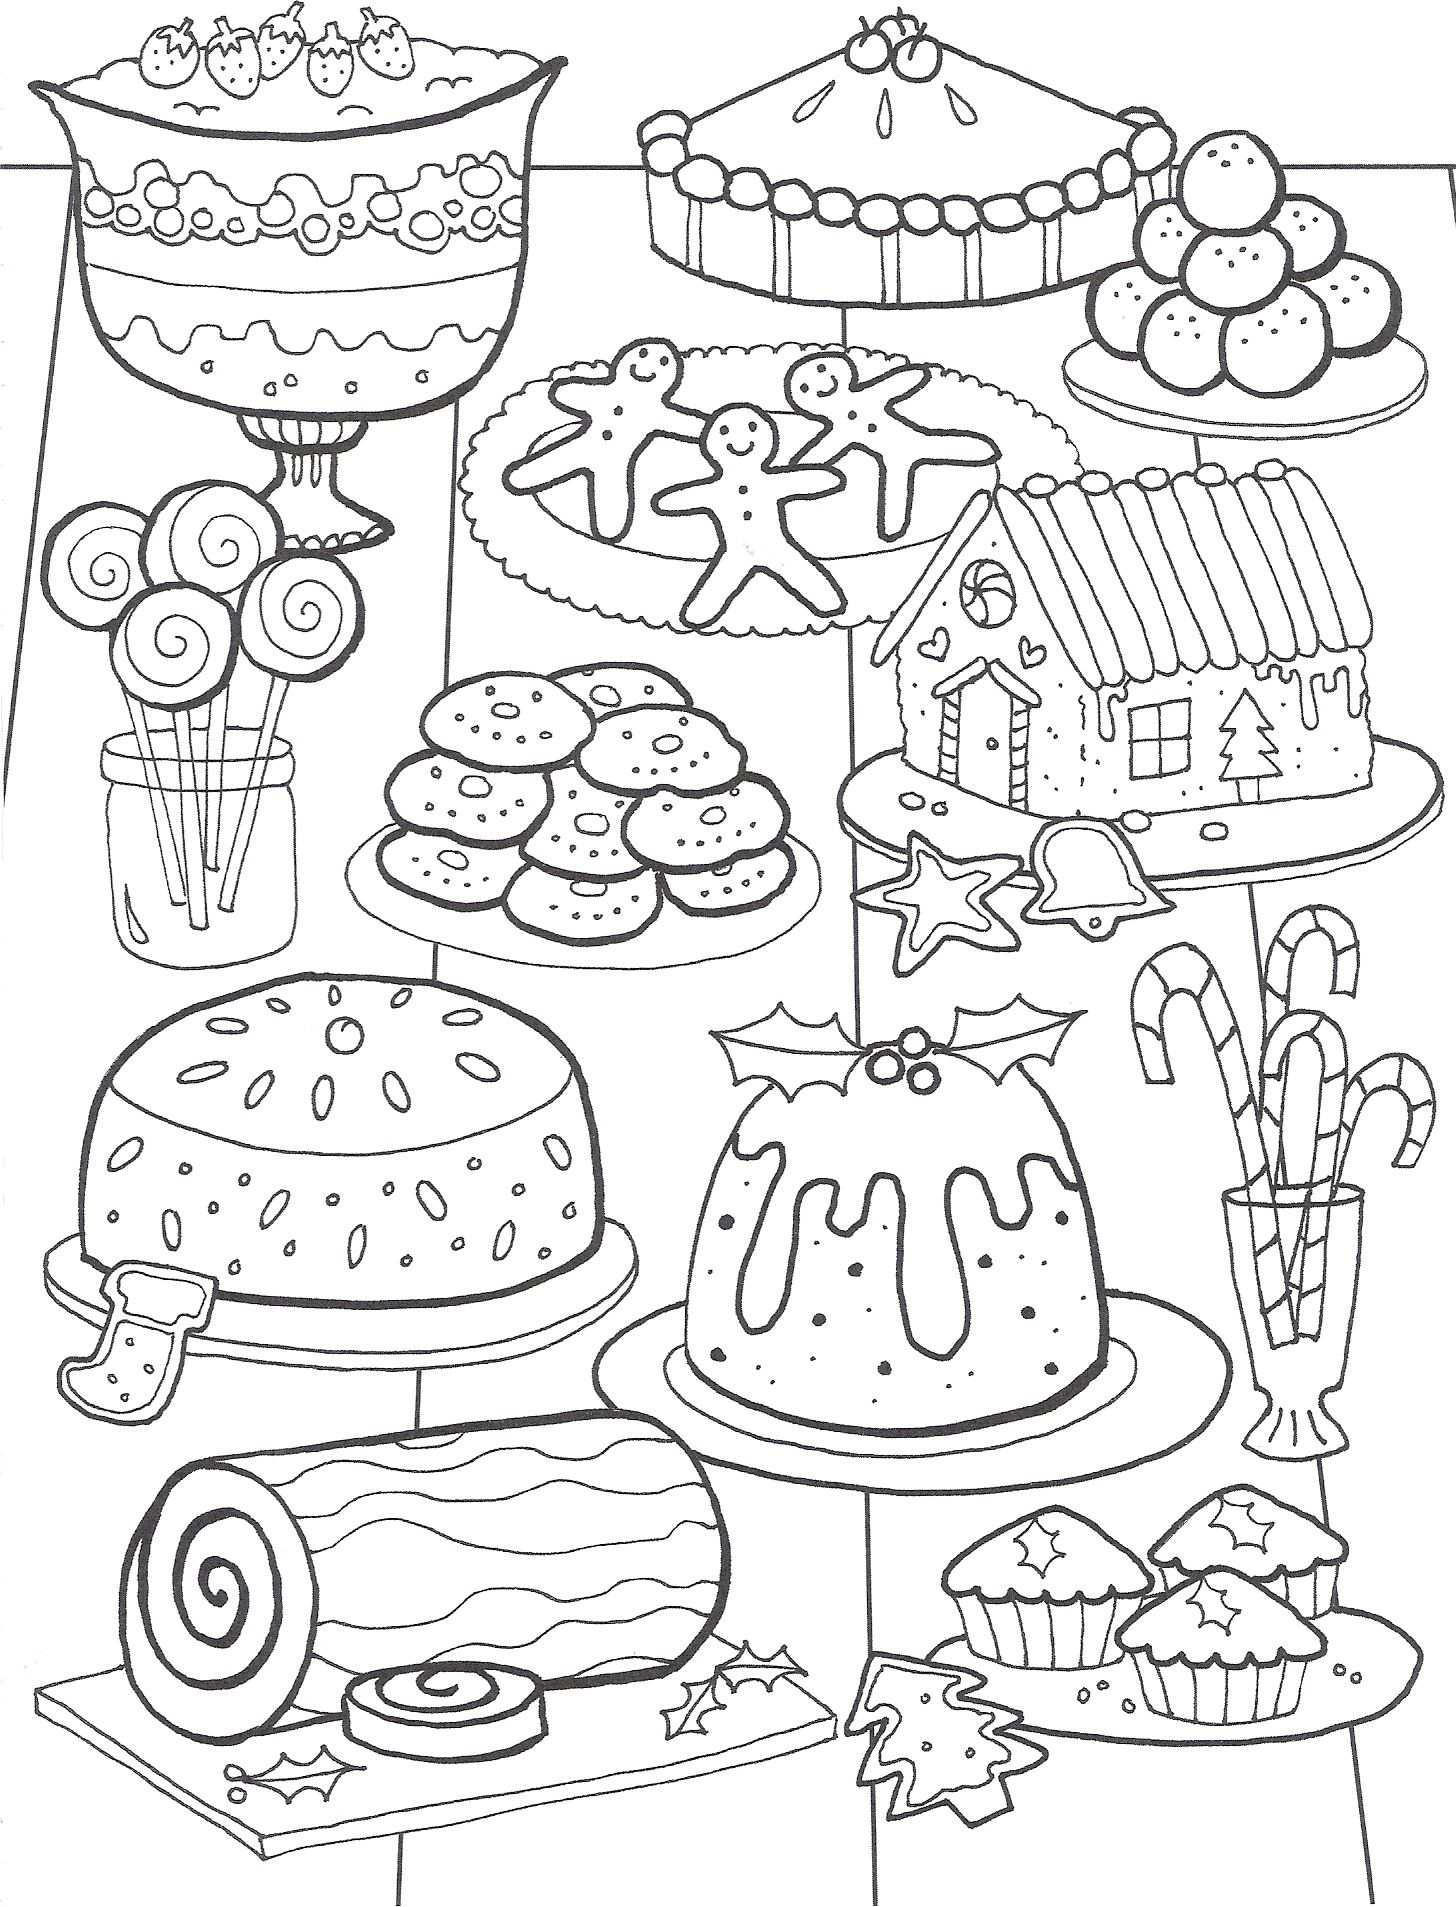 Kleurplaat Kleurplaten Kleurboek Kerstmis Kleurplaten